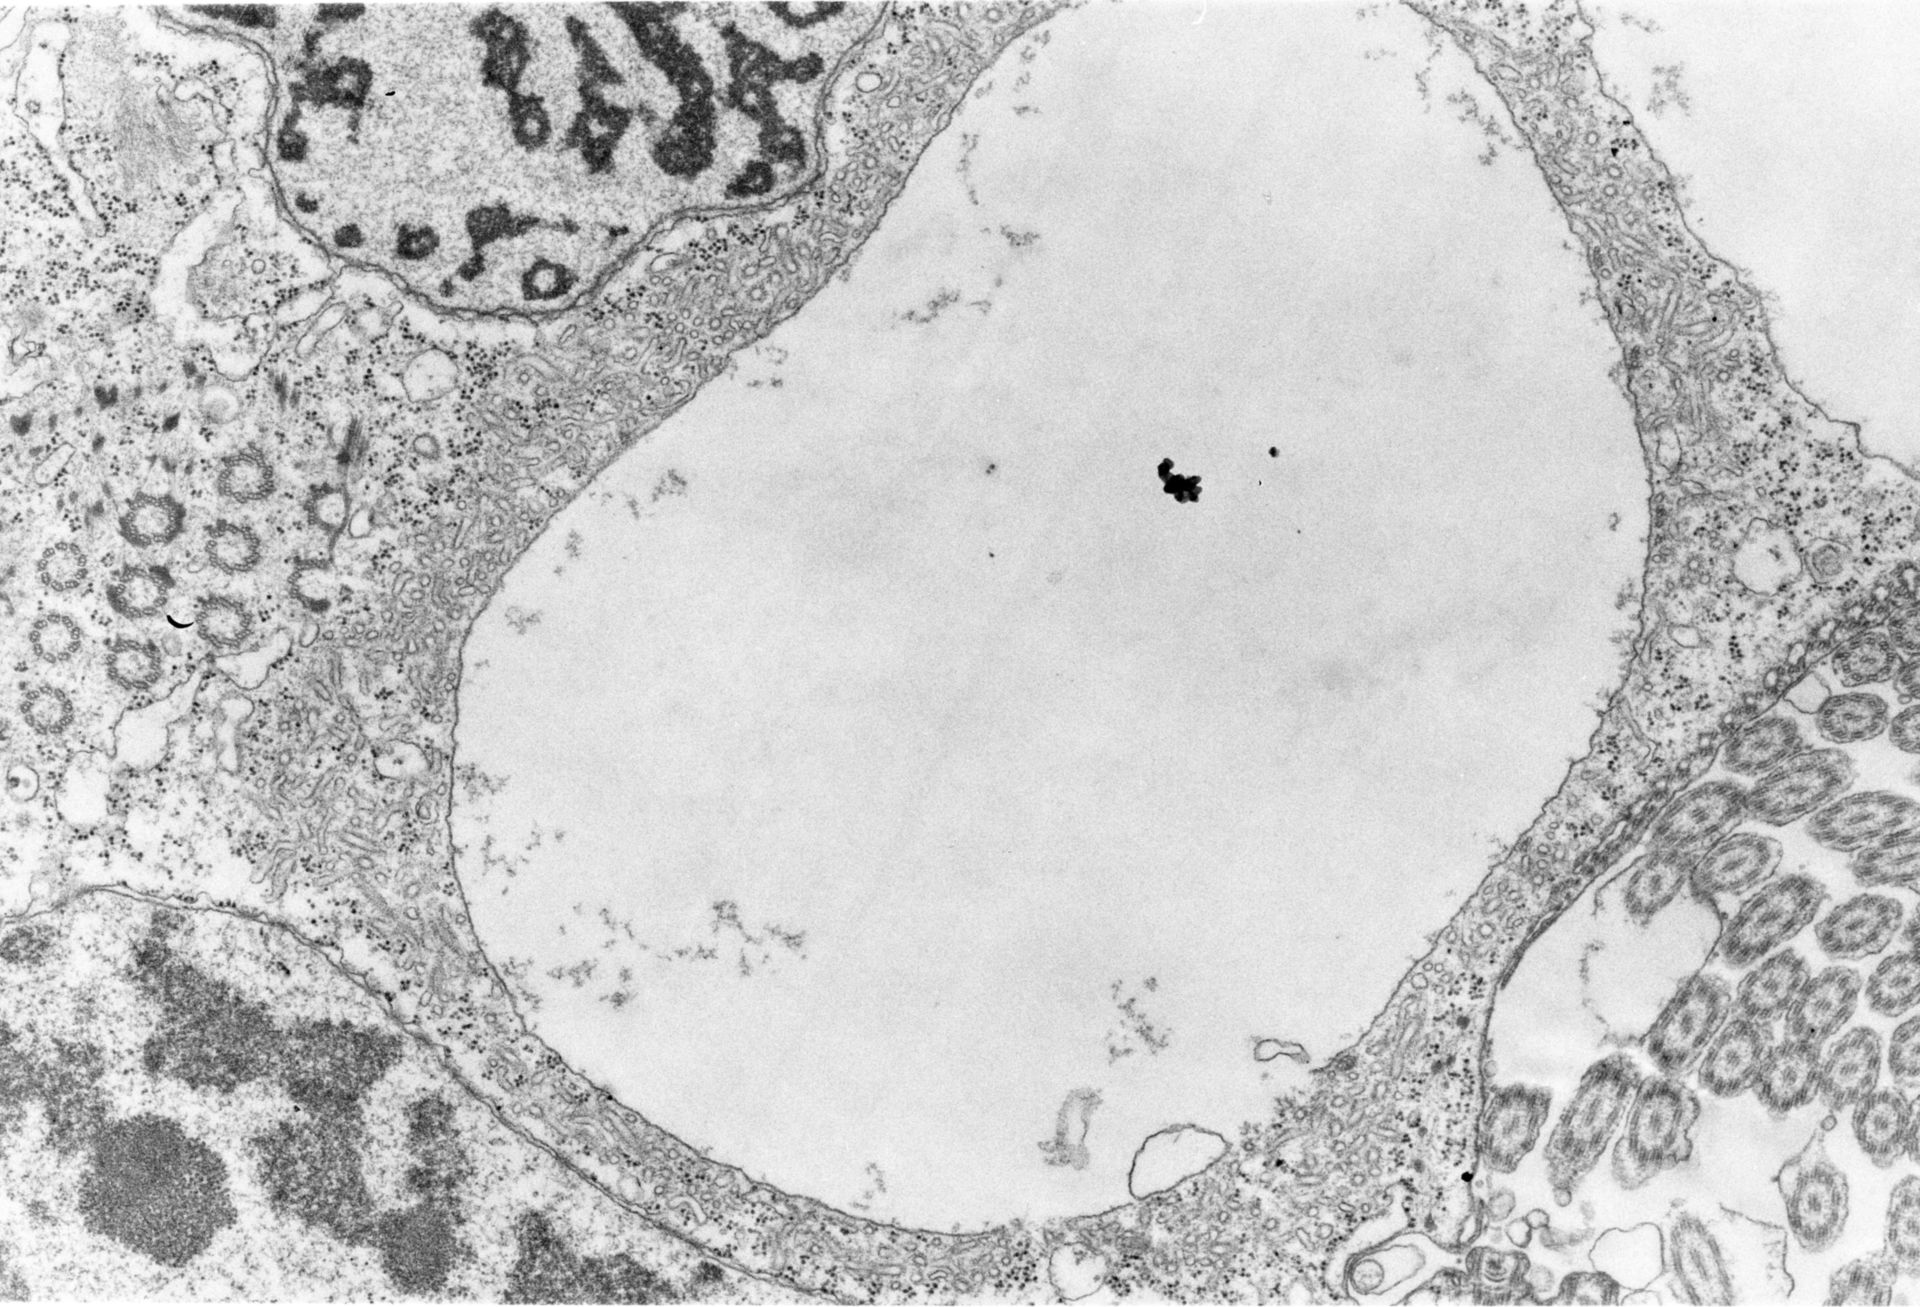 Opercularia coarctata (corpo basali microtubuli) - CIL:7334